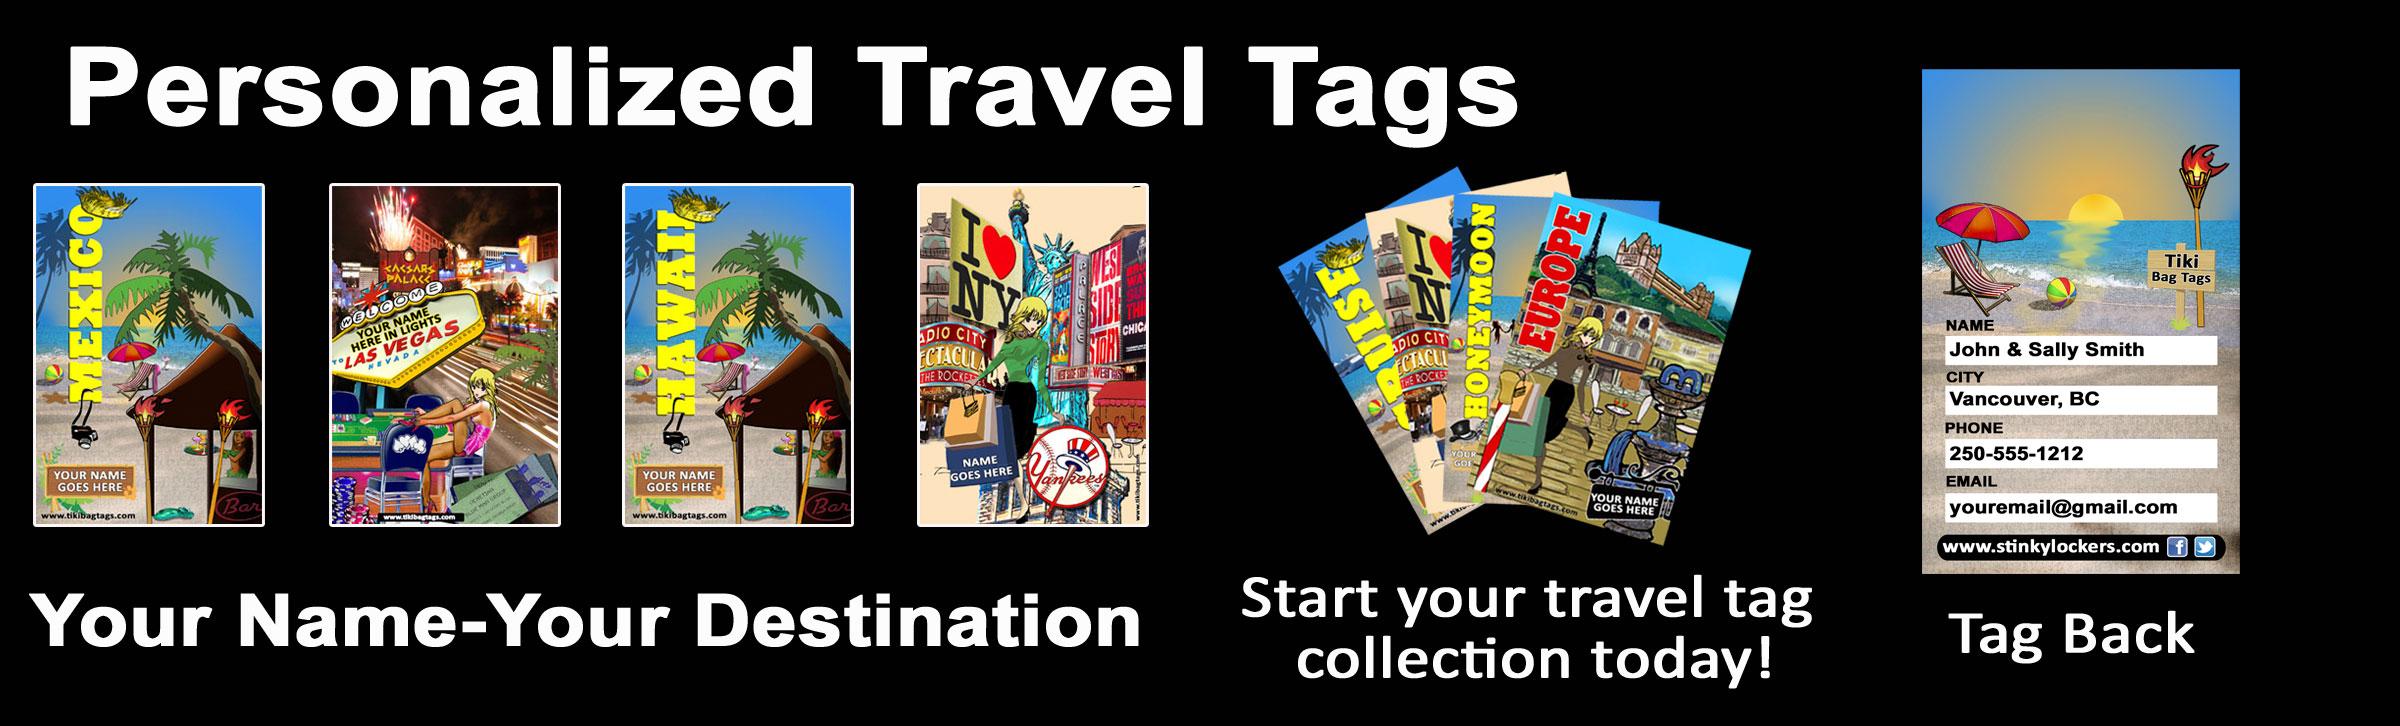 travel-categoryv4.jpg